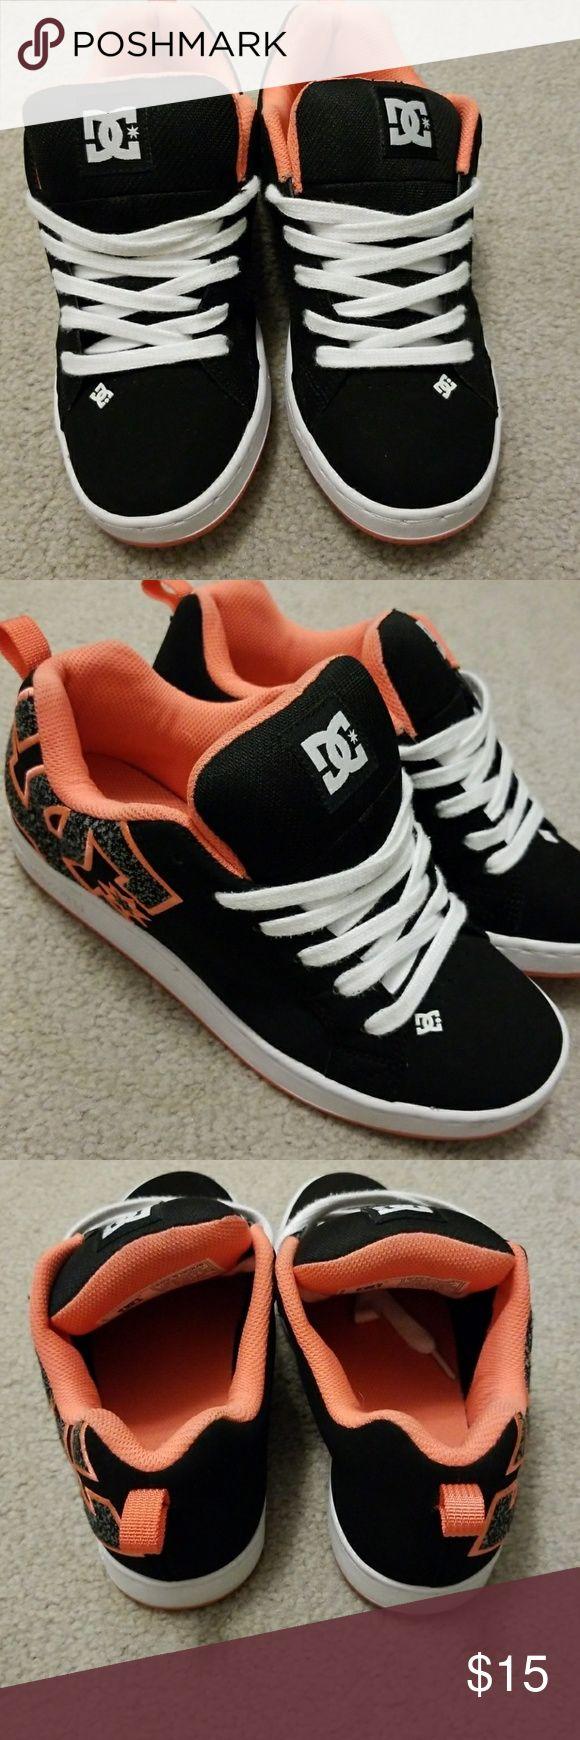 DC Skate shoes size 6W DC Skate shoes size 6W DC Shoes